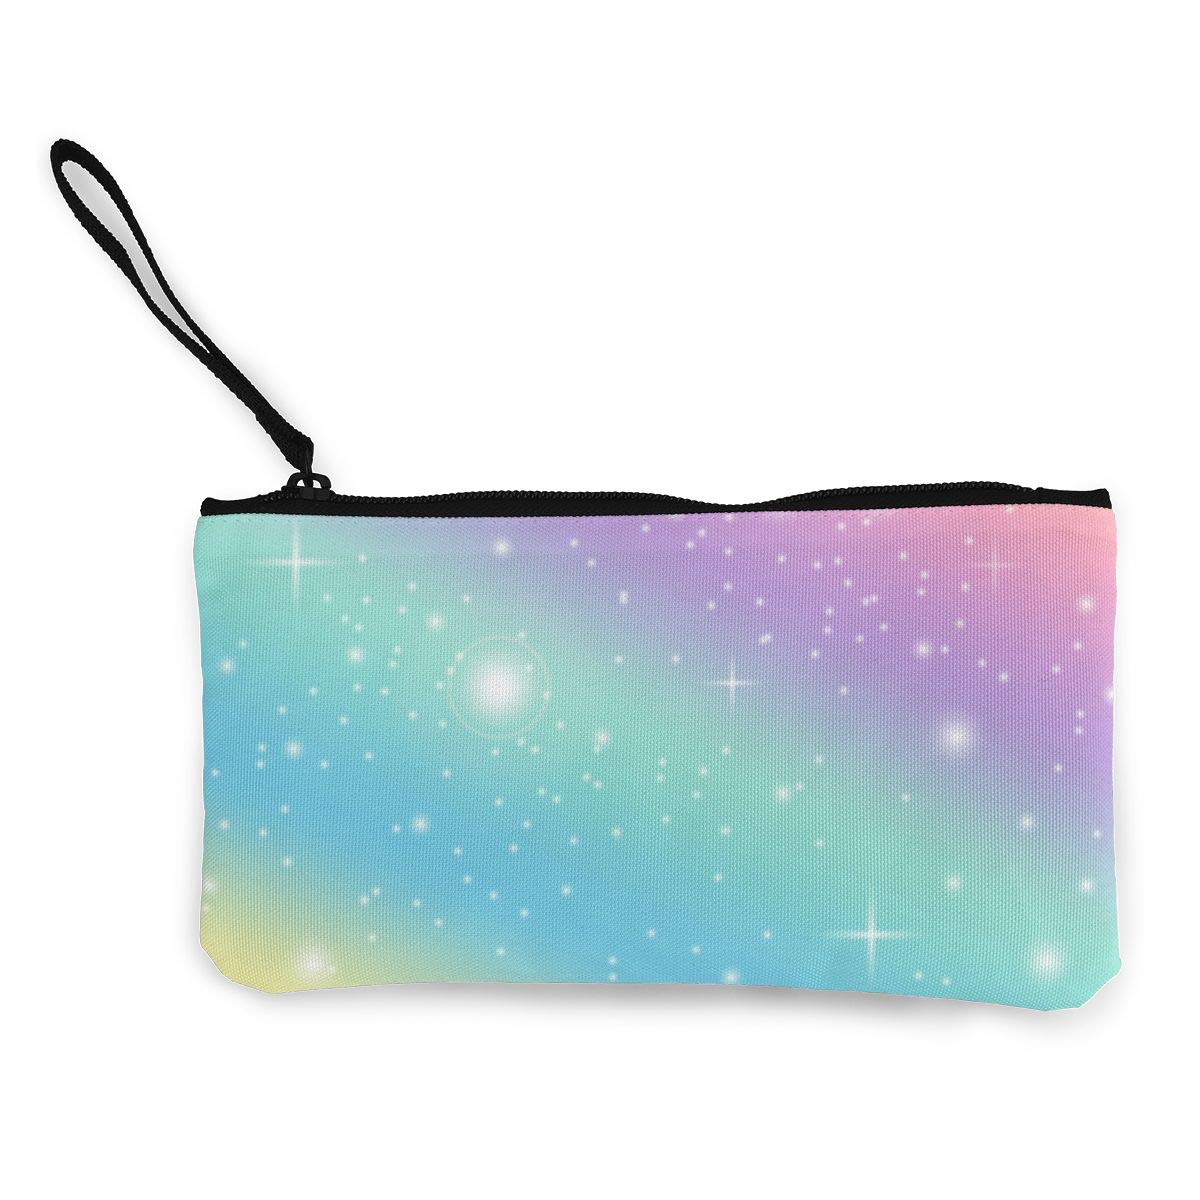 TR7FD15DE Rainbow Zipper Canvas Coin Purse Wallet Make Up Bag Cellphone Bag With Handle